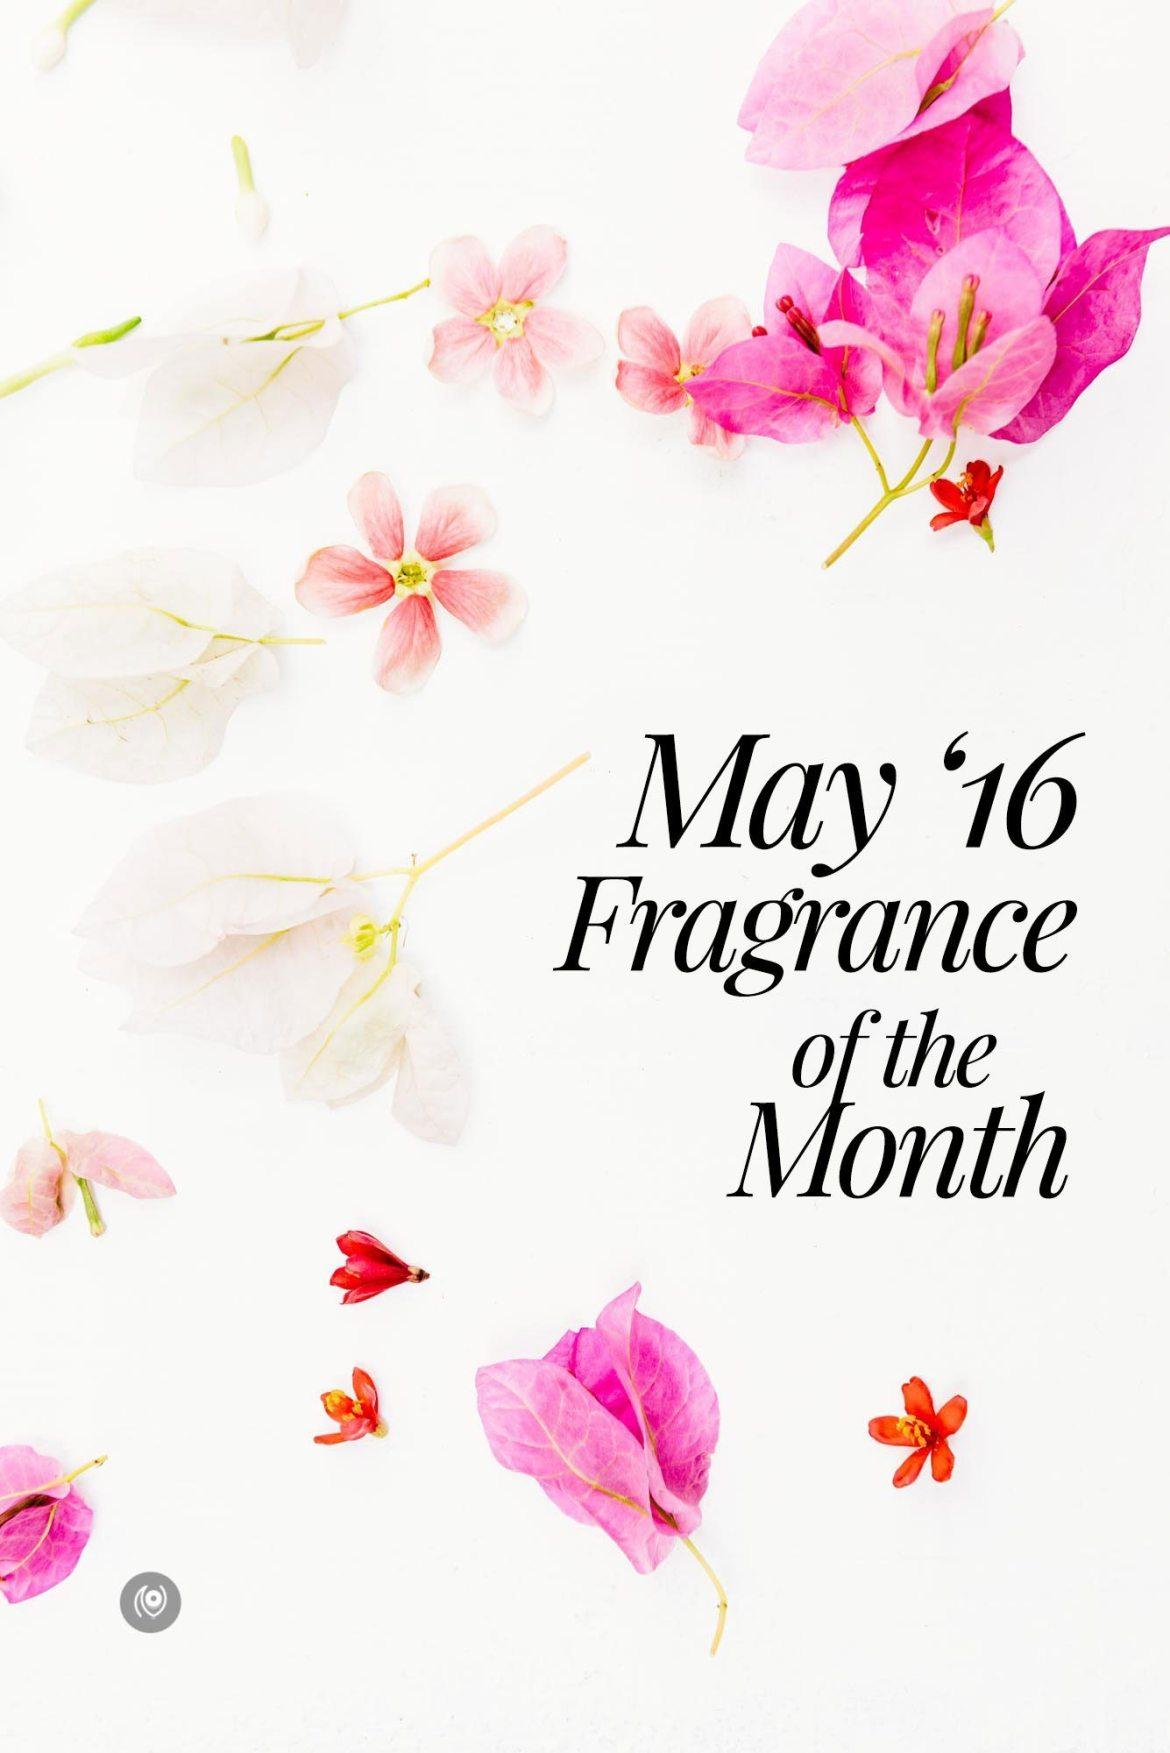 FragranceOfTheMonth-Naina.co-Jour-Hermes-Gardenia-EyesForLuxury-01